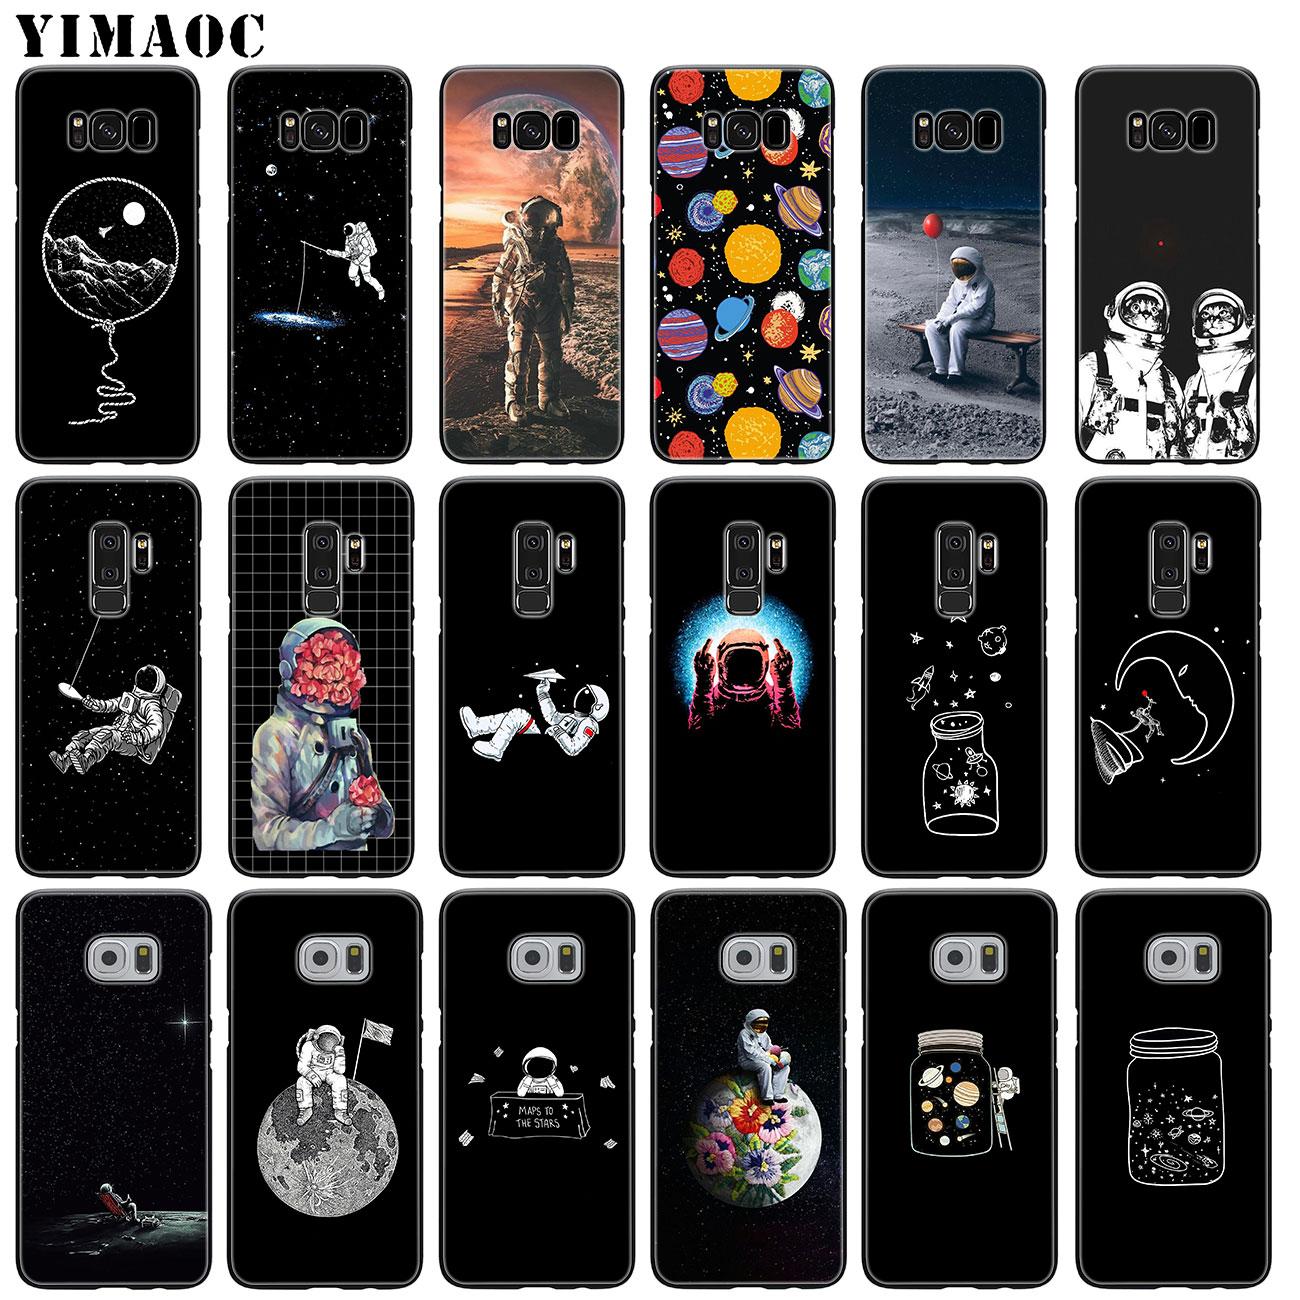 YIMAOC Planeta, astronauta universo espacio Luna suave silicona teléfono funda para Samsung Galaxy S10 S9 S8 Plus S7 S6 Edge S10e E Cubierta